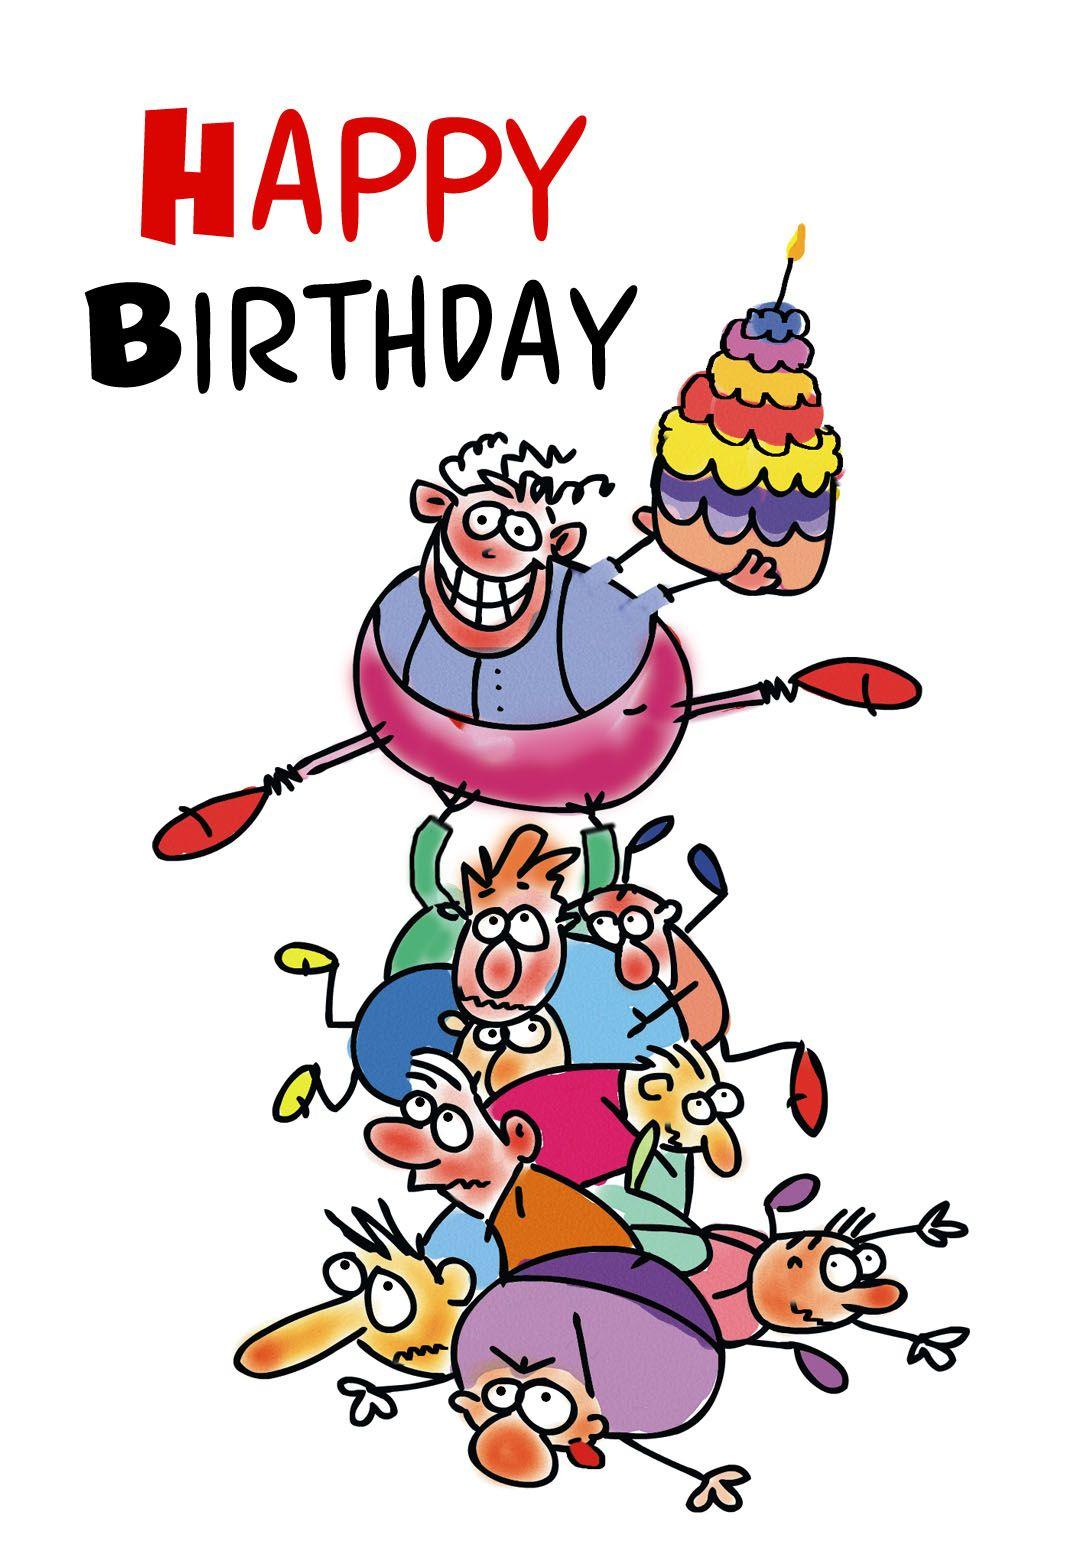 Free Printable Funny Birthday Greeting Card | Gifts To Make | Free - Free Printable 50Th Birthday Cards Funny